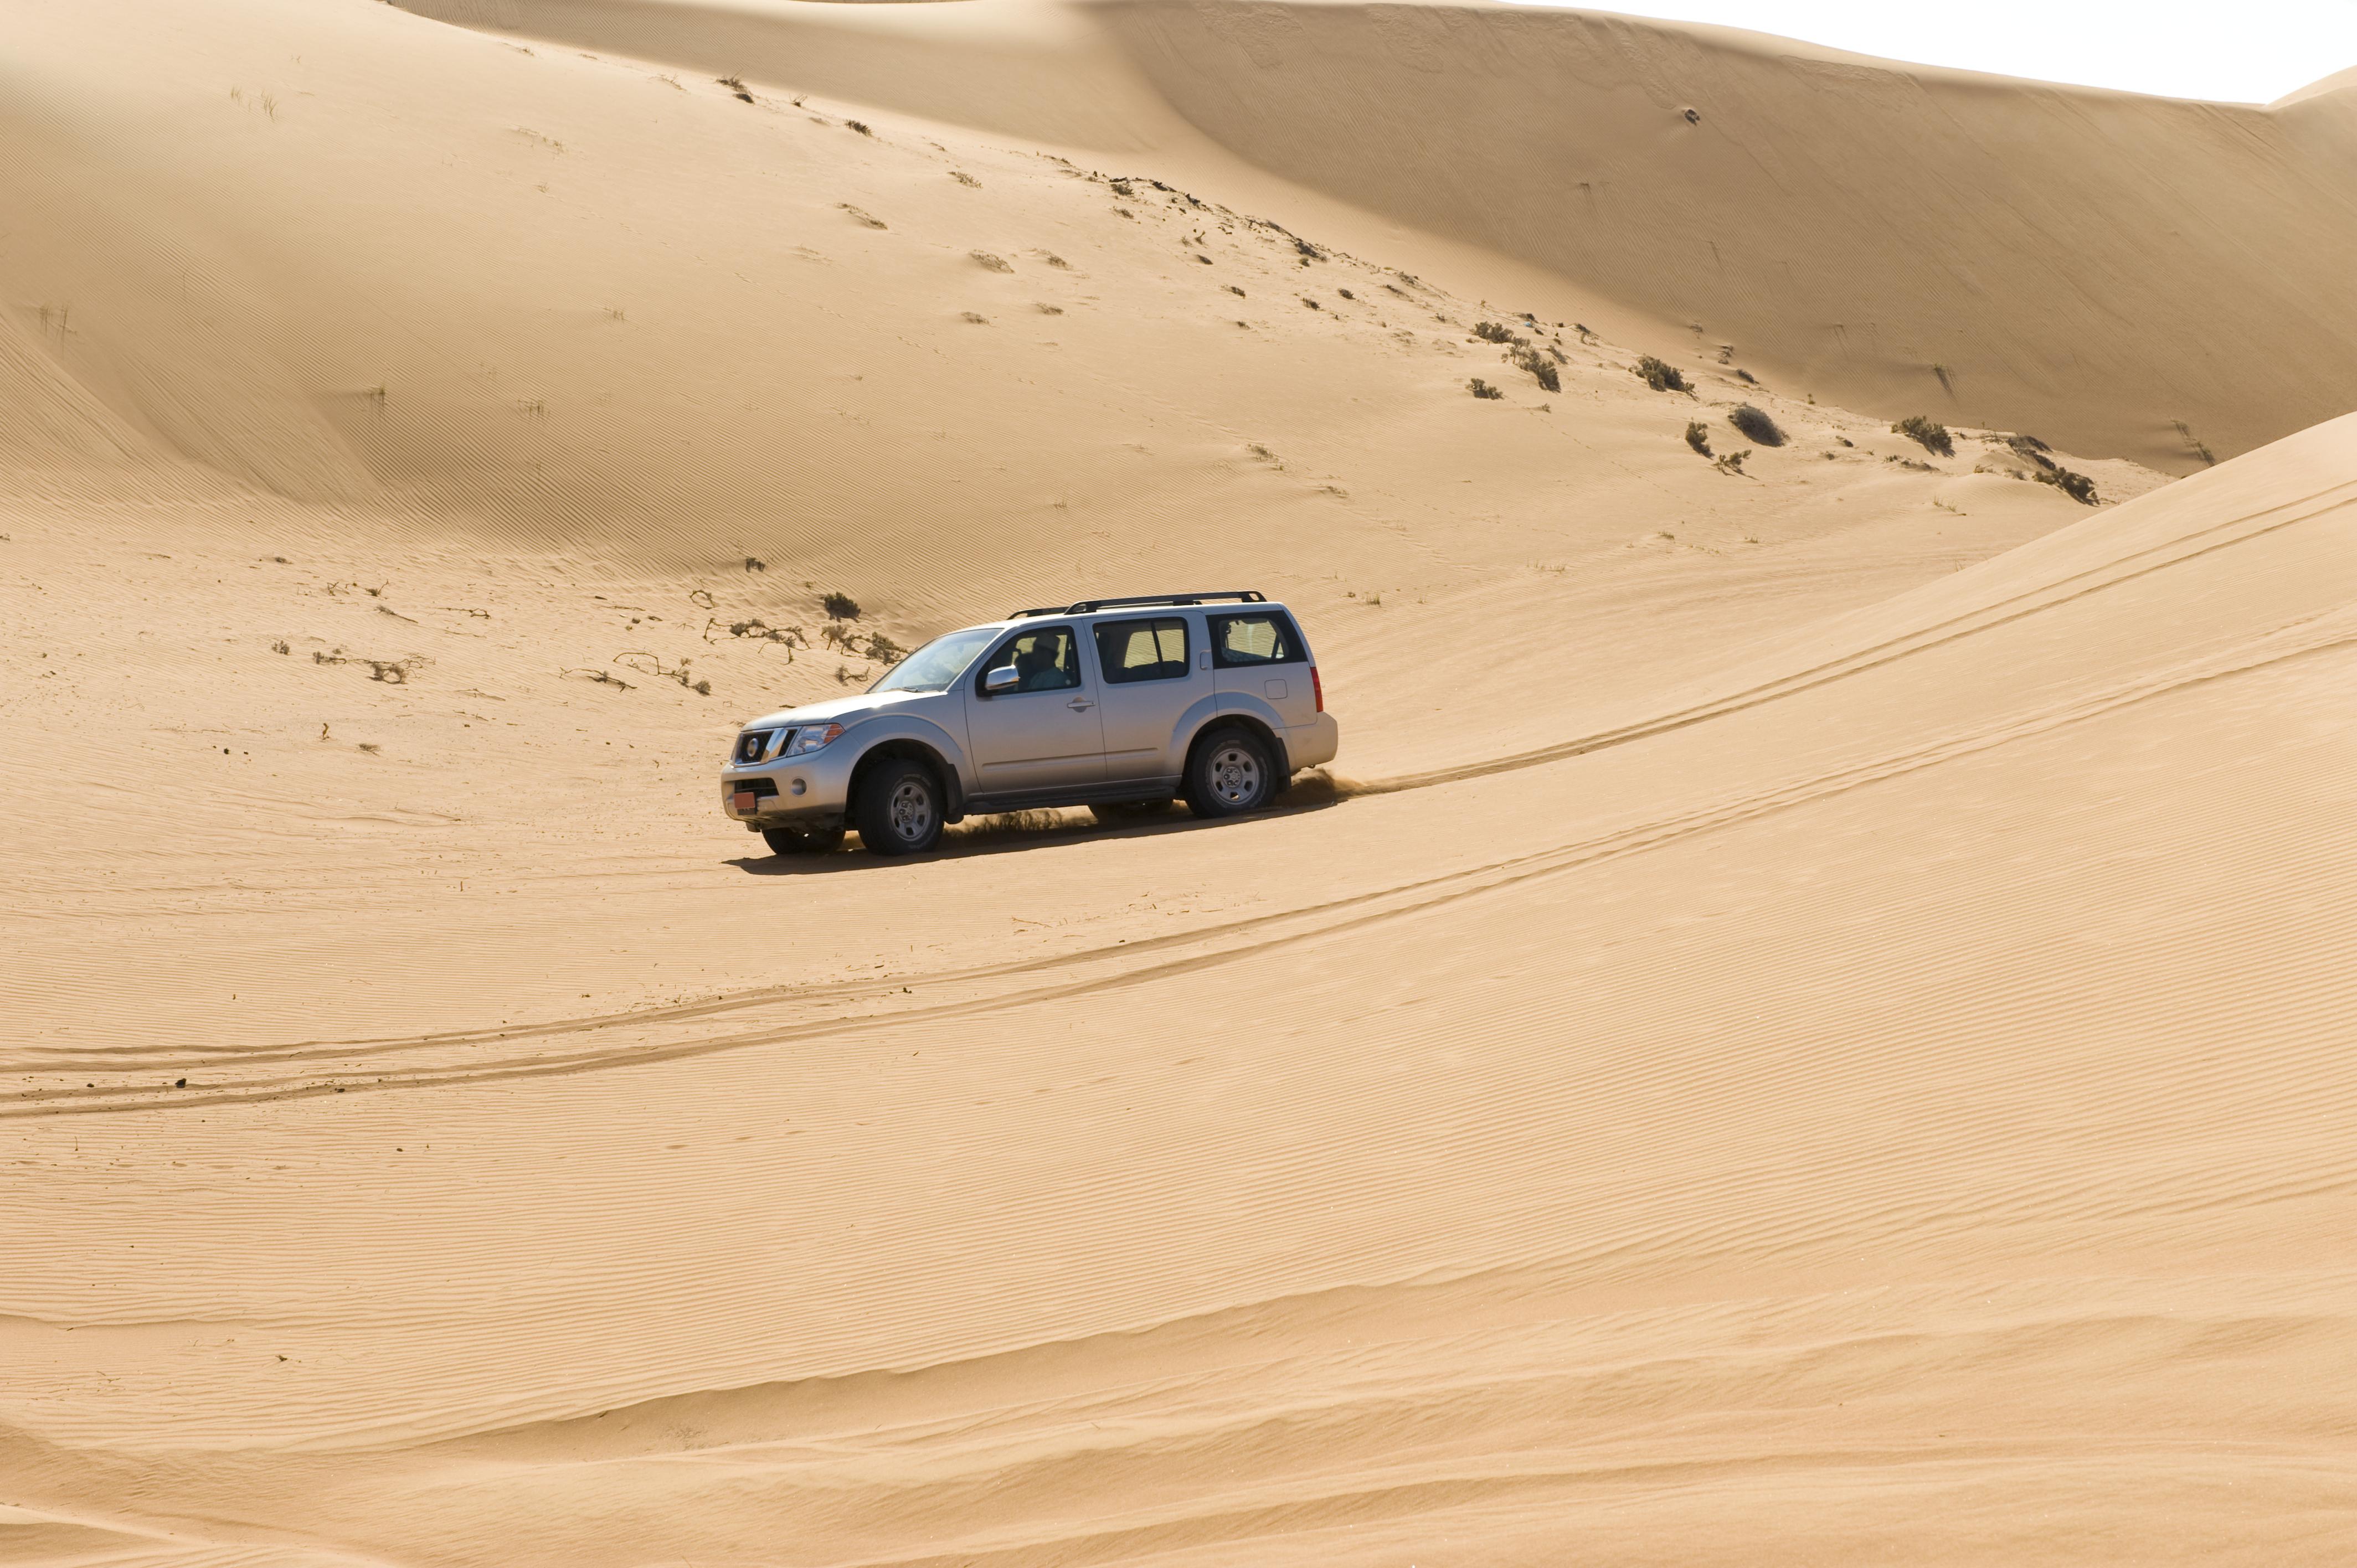 Enjoy a jeep safari in Oman's Wahiba desert